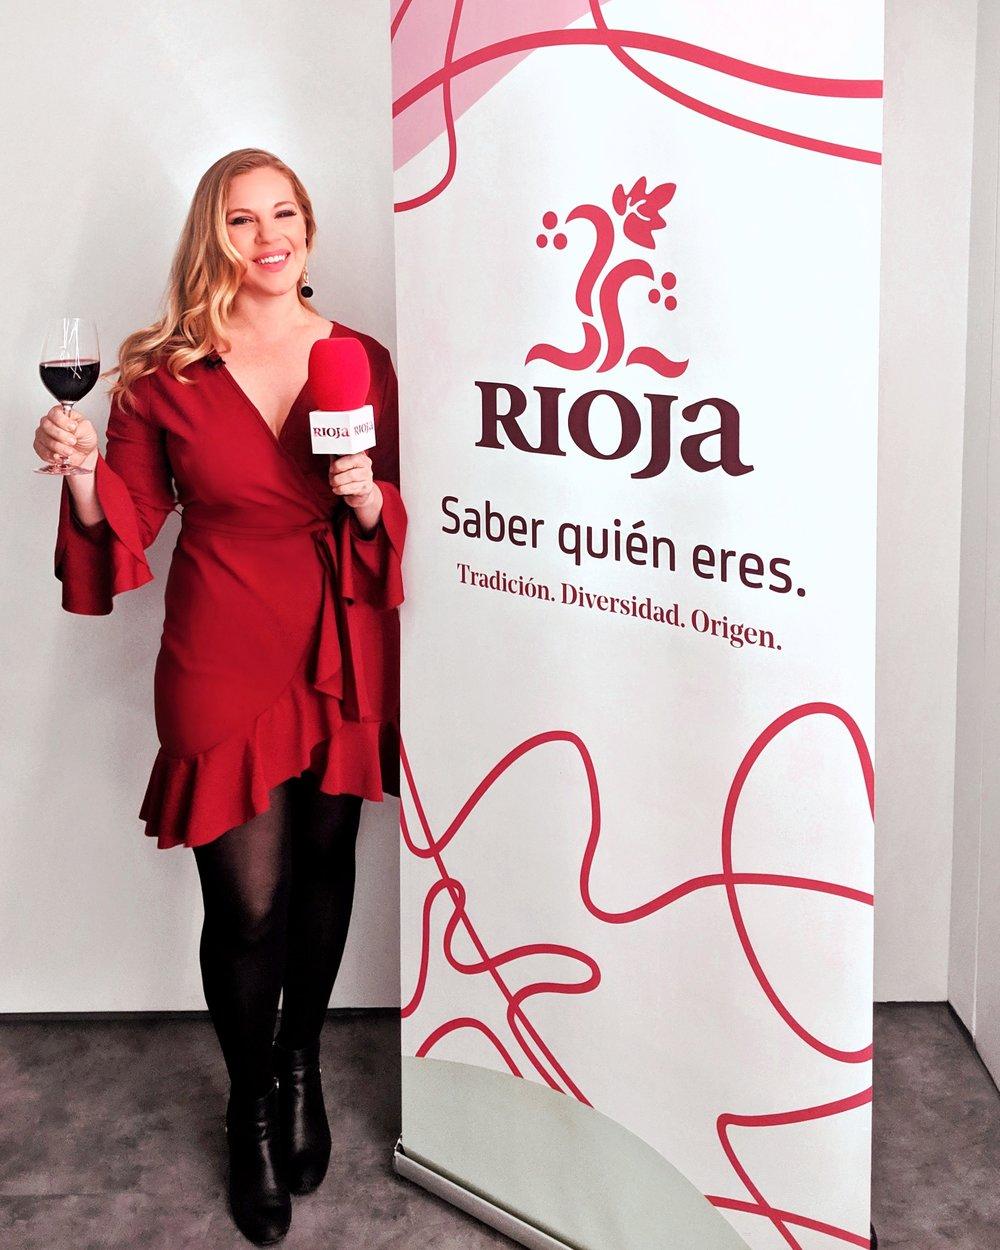 rioja-2.jpg